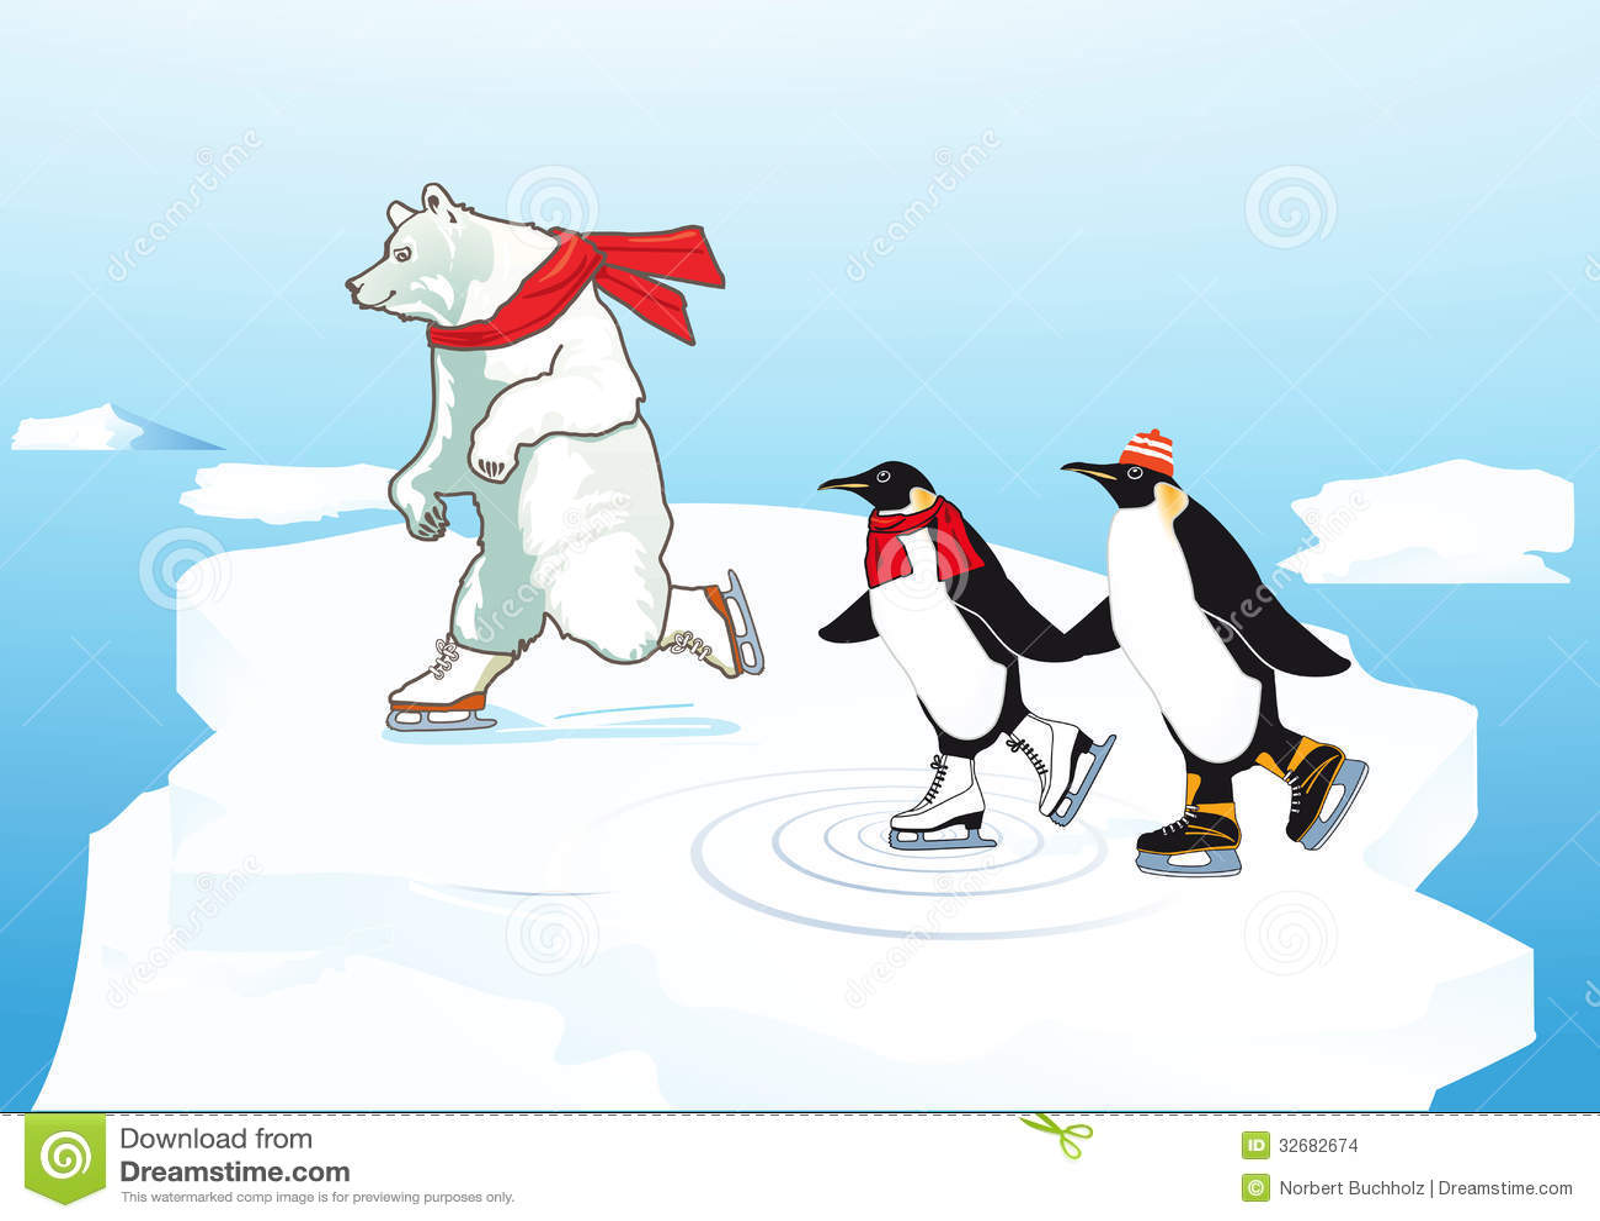 polar bear and penguins ice skating stock vector